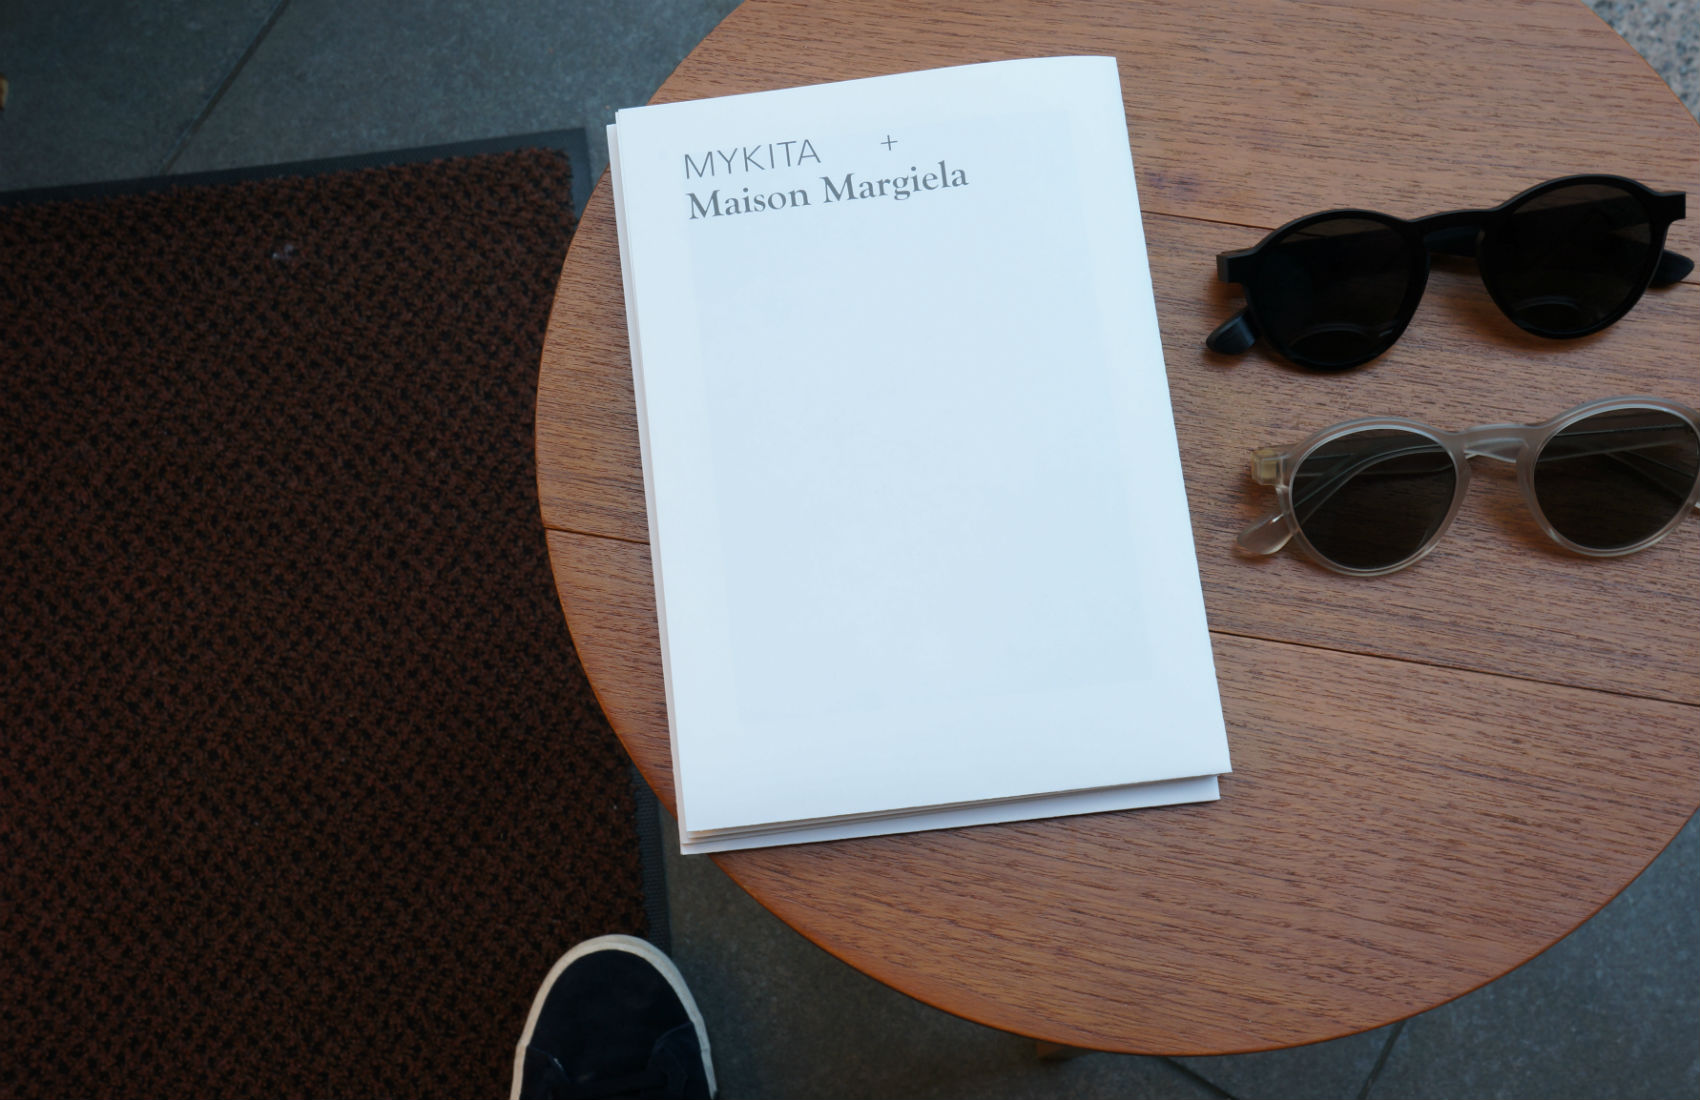 MYKITA+Maison Margiela MMRAW002 6